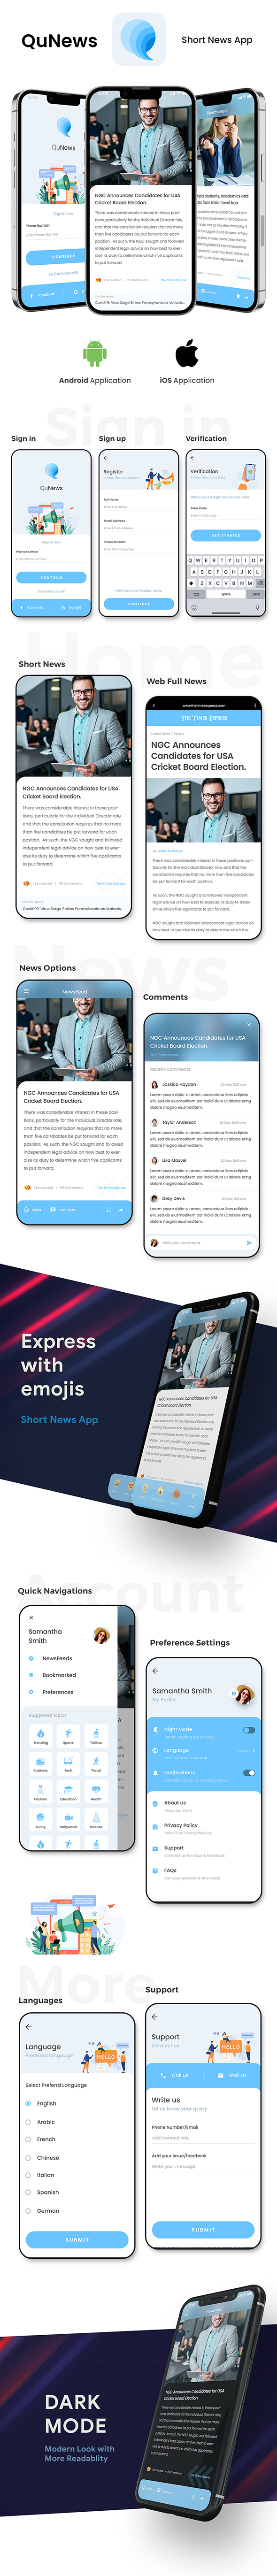 Short News Android App Template + iOS App Template | IONIC 5 | News App | QuNews - 2